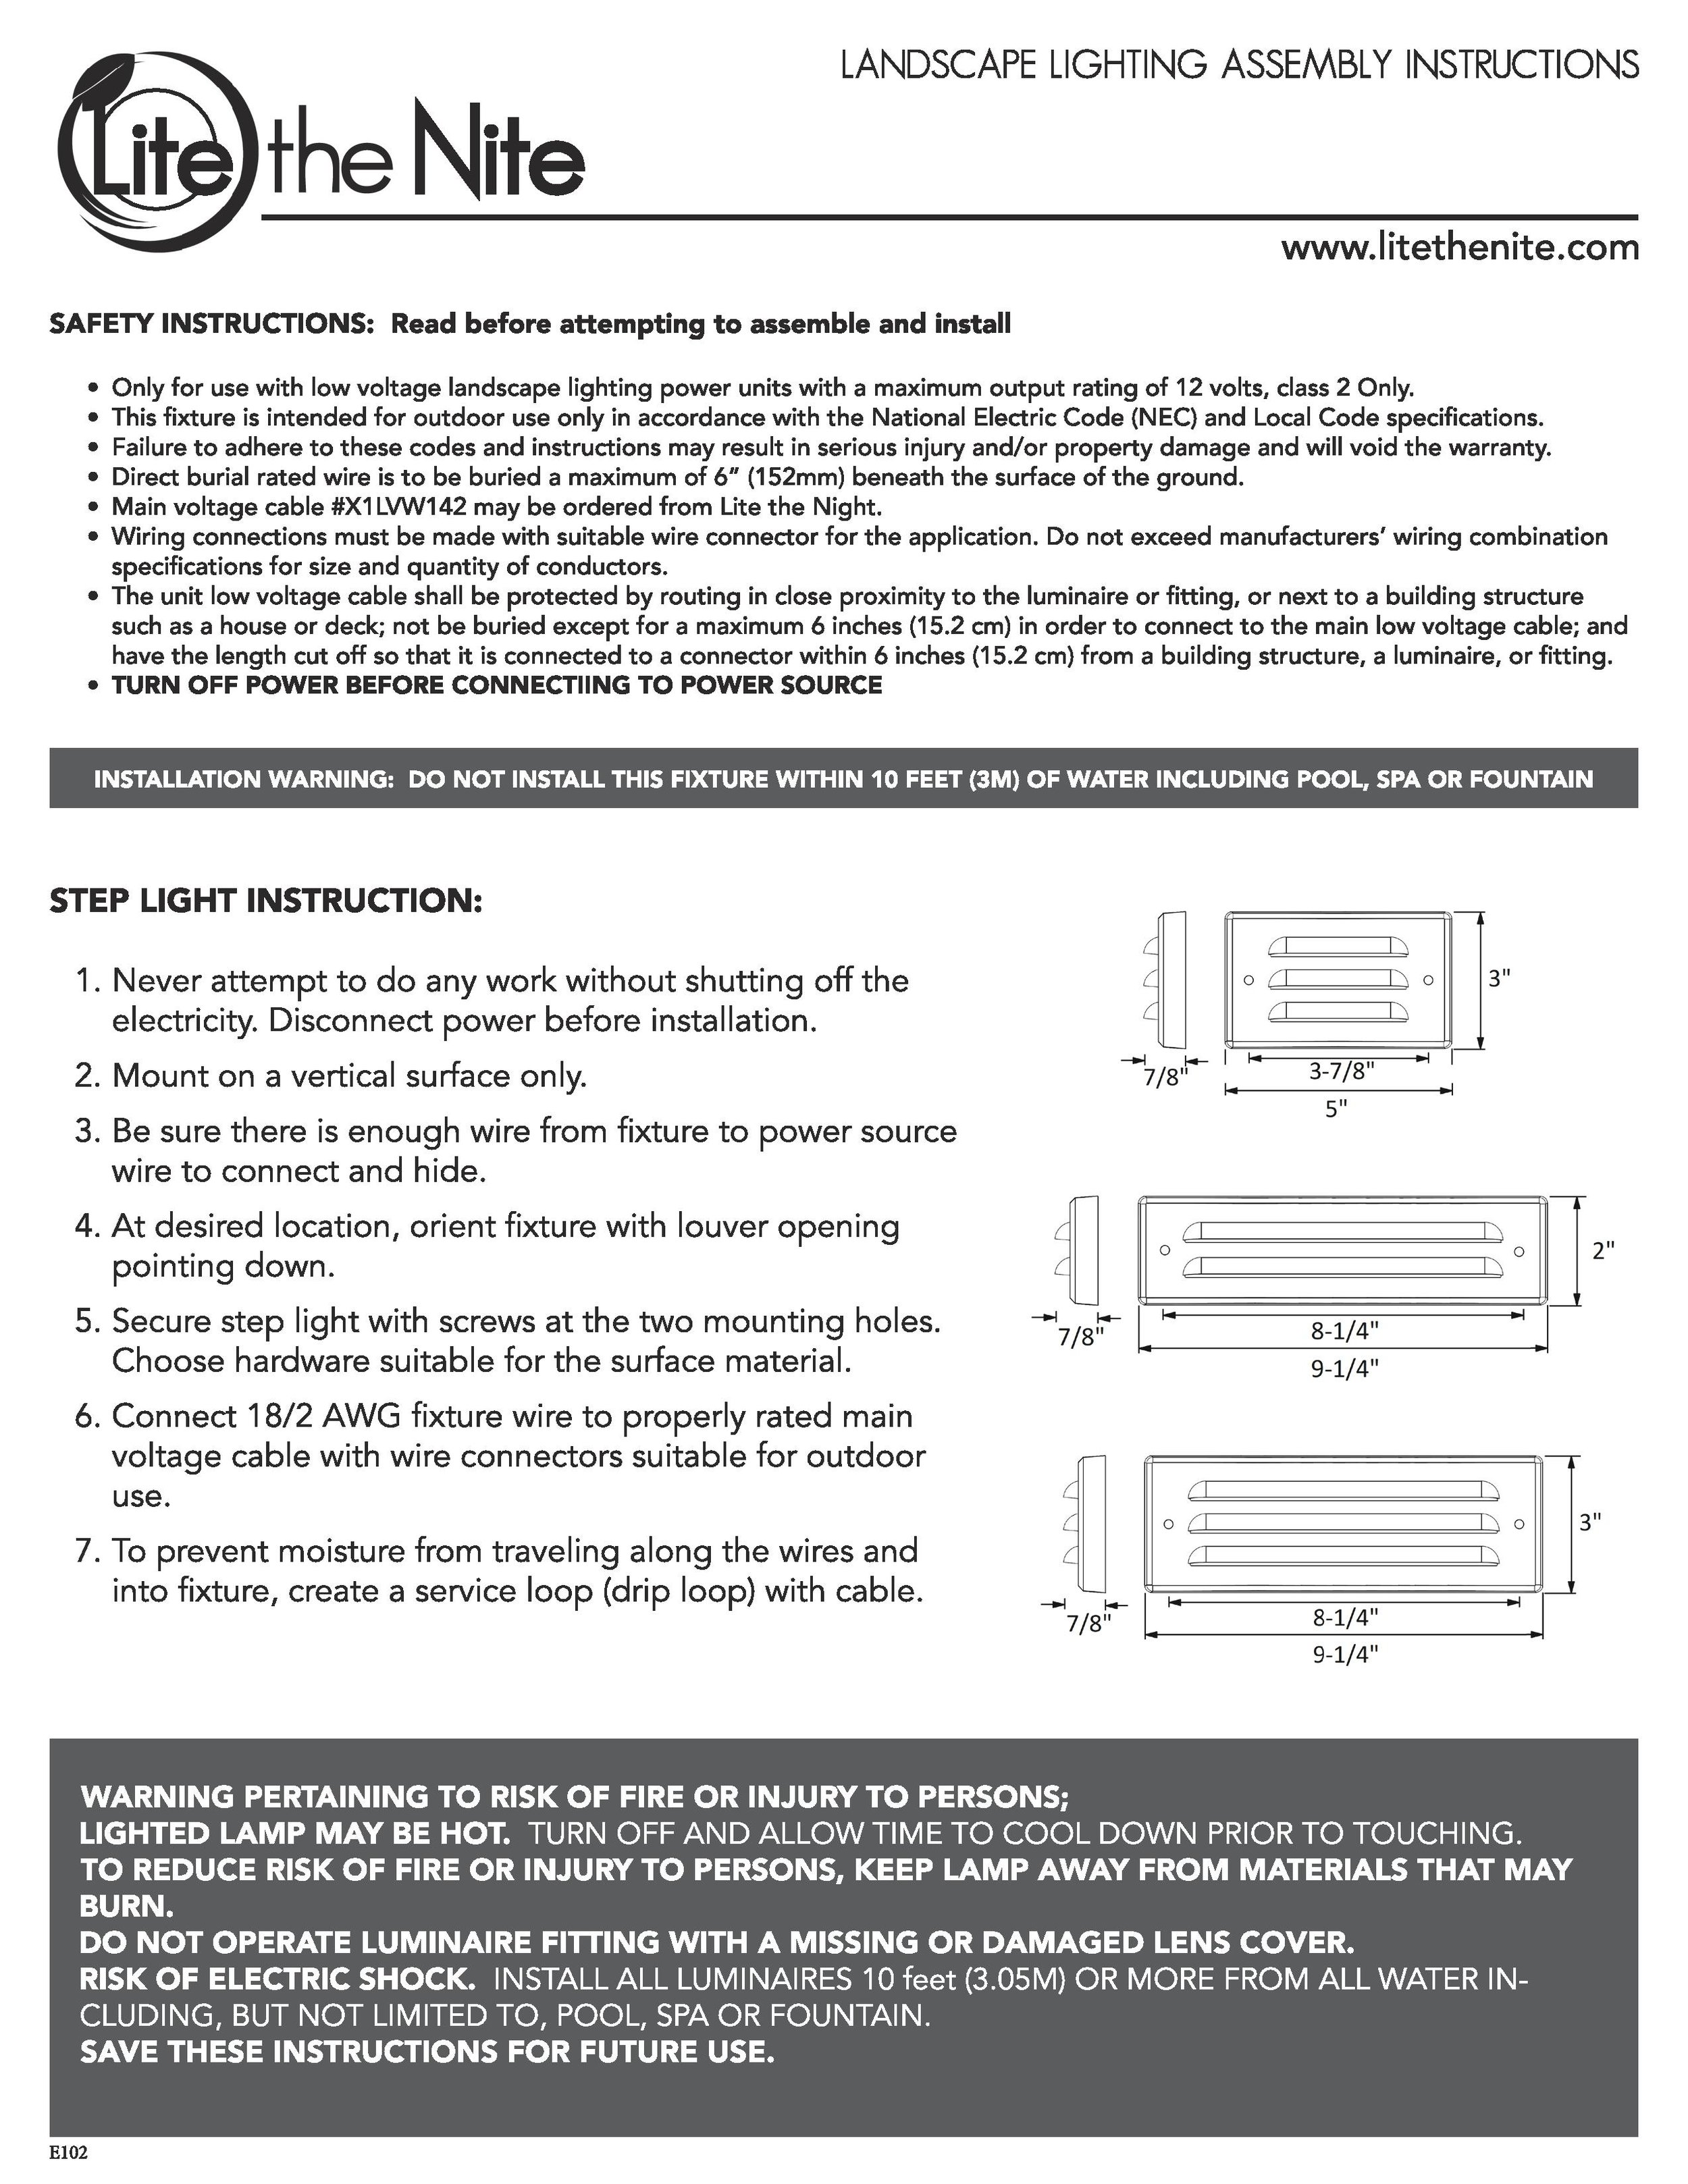 Step Light Inst_E103-180130-page-001.jpg